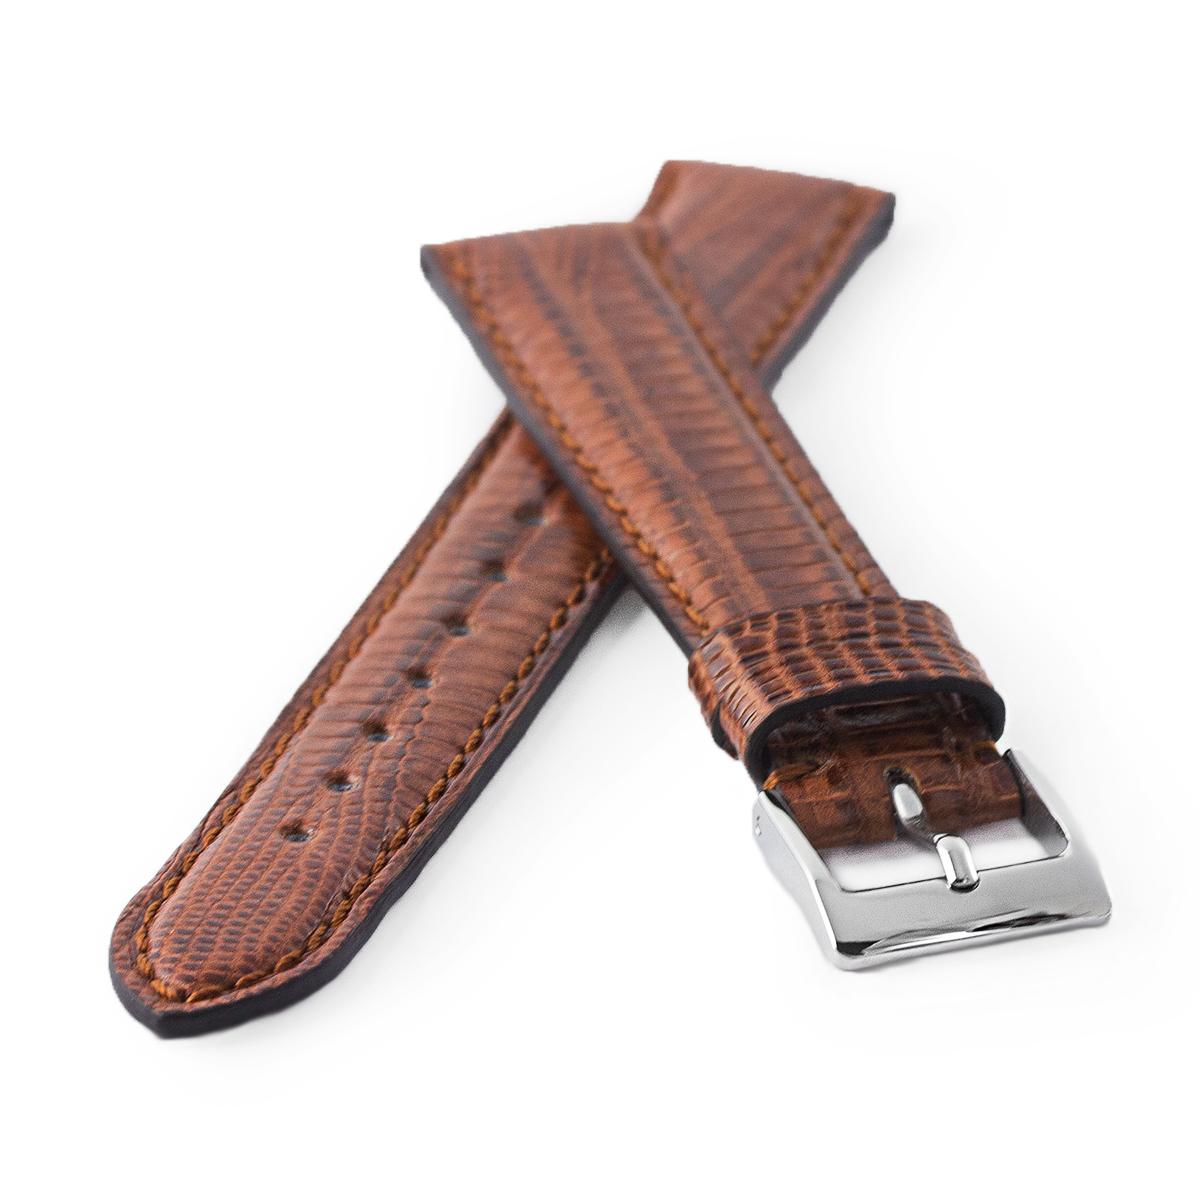 https://www.ebay.de/itm/Uhrenarmband-Kaufmann-Teju-Eidechse-gold-Leder-Armband-/263632141406